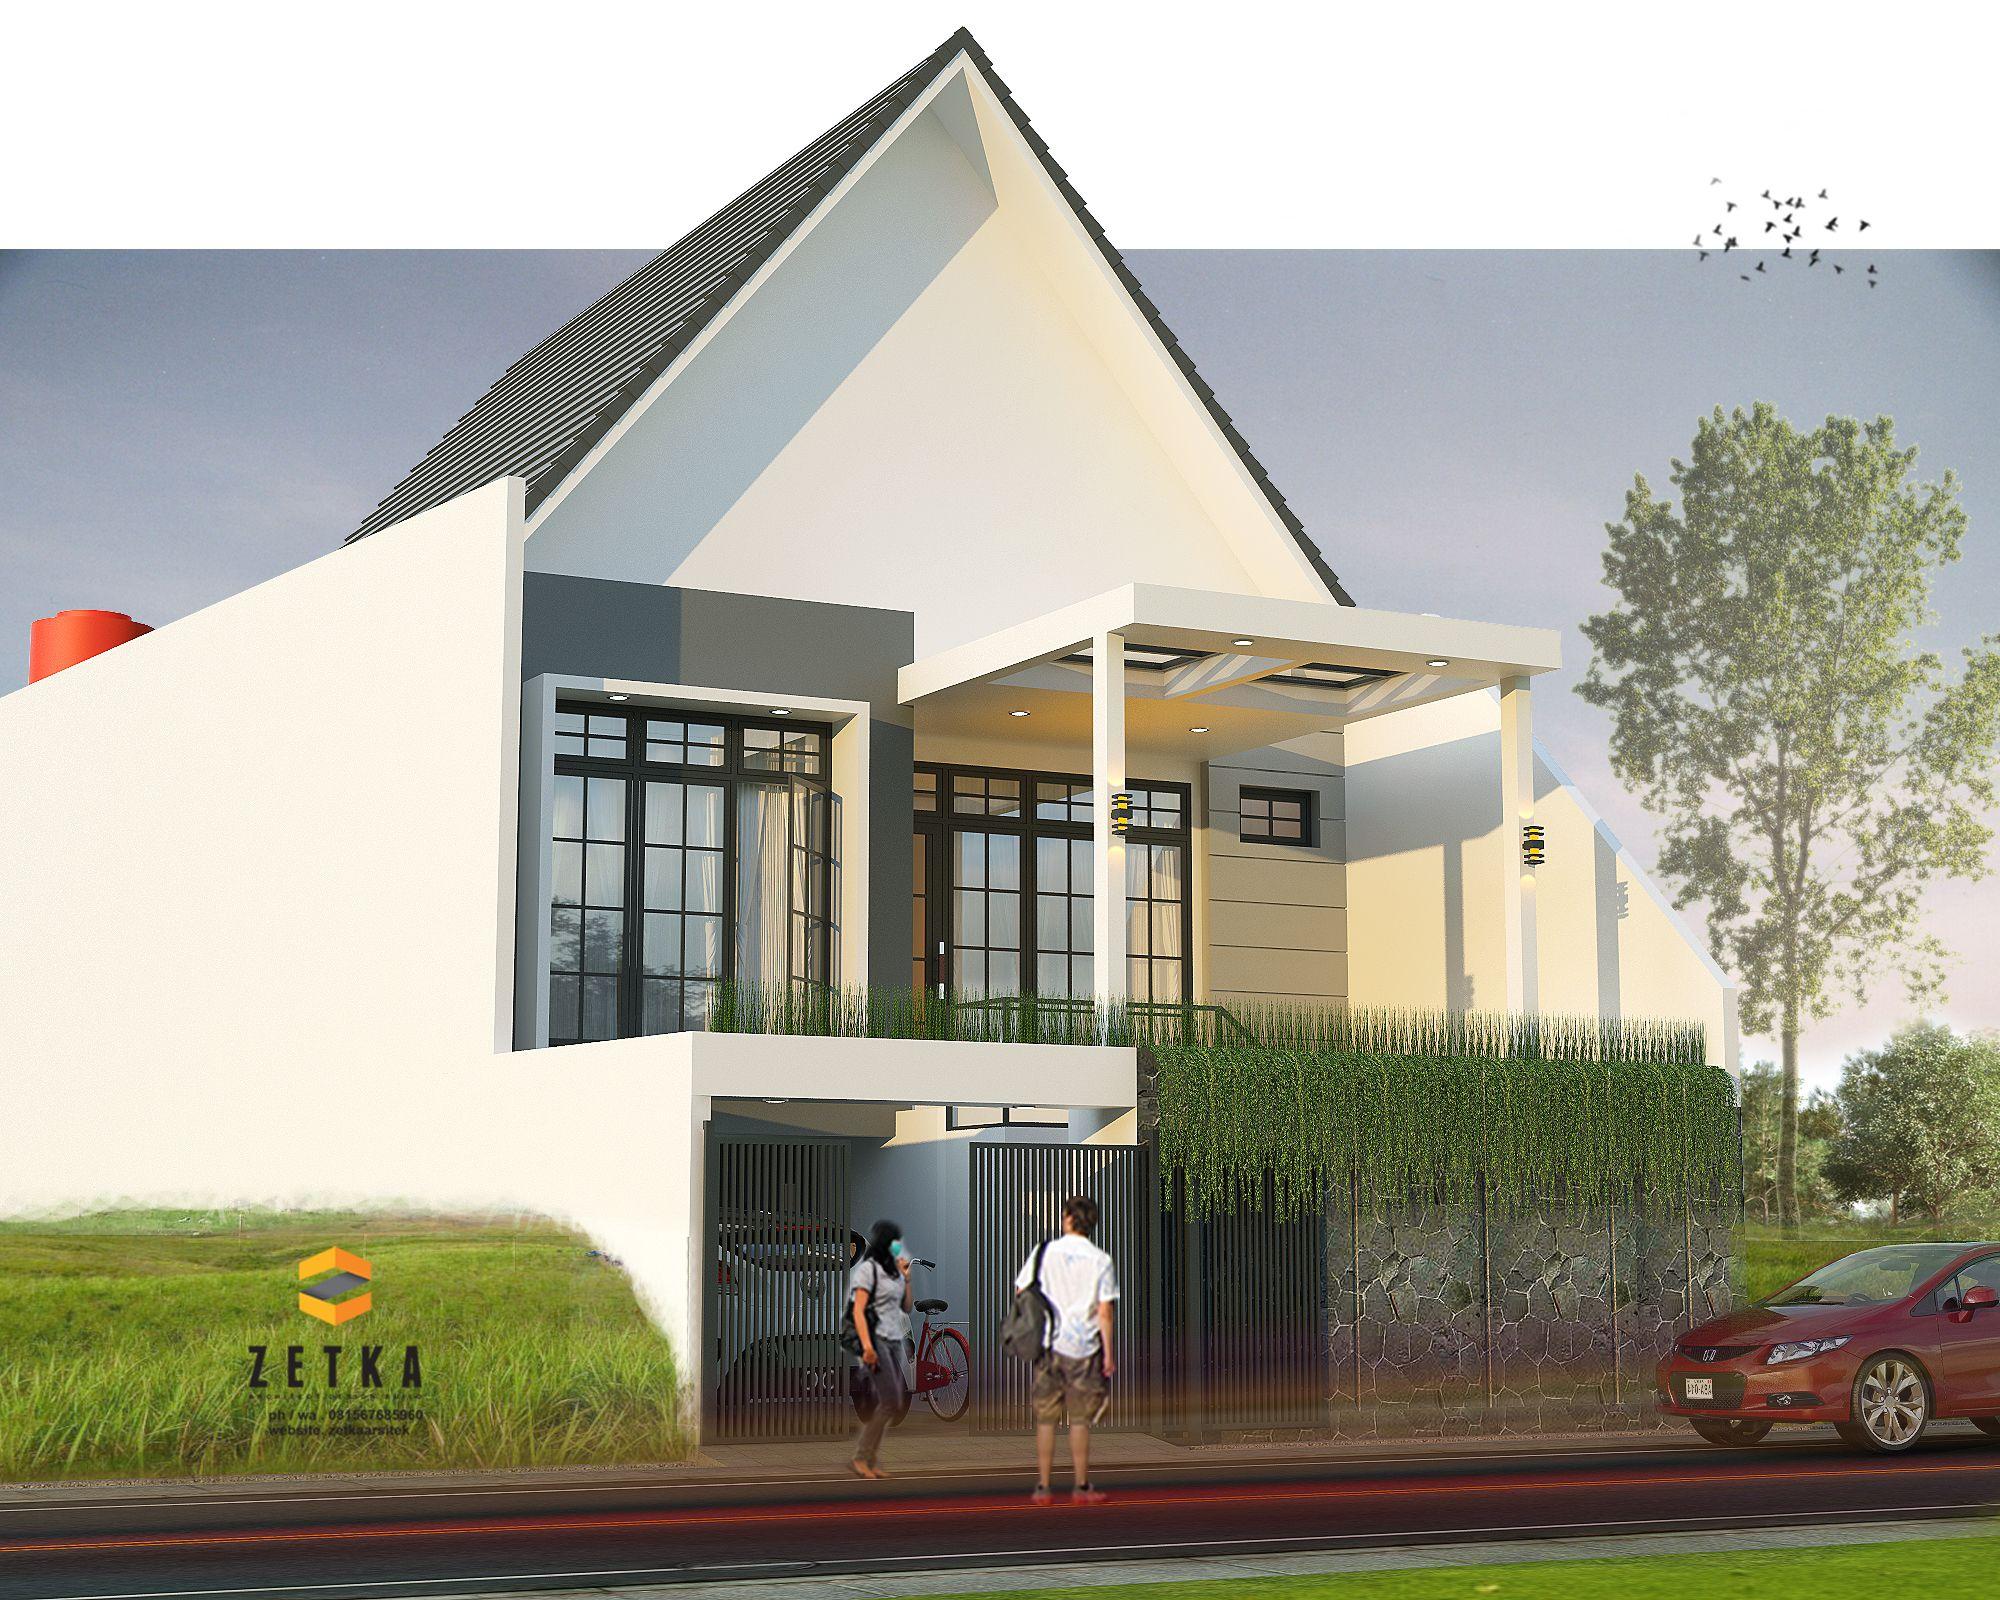 rumah 1 lantai namun dengan tanah yang tinggi mampu untuk